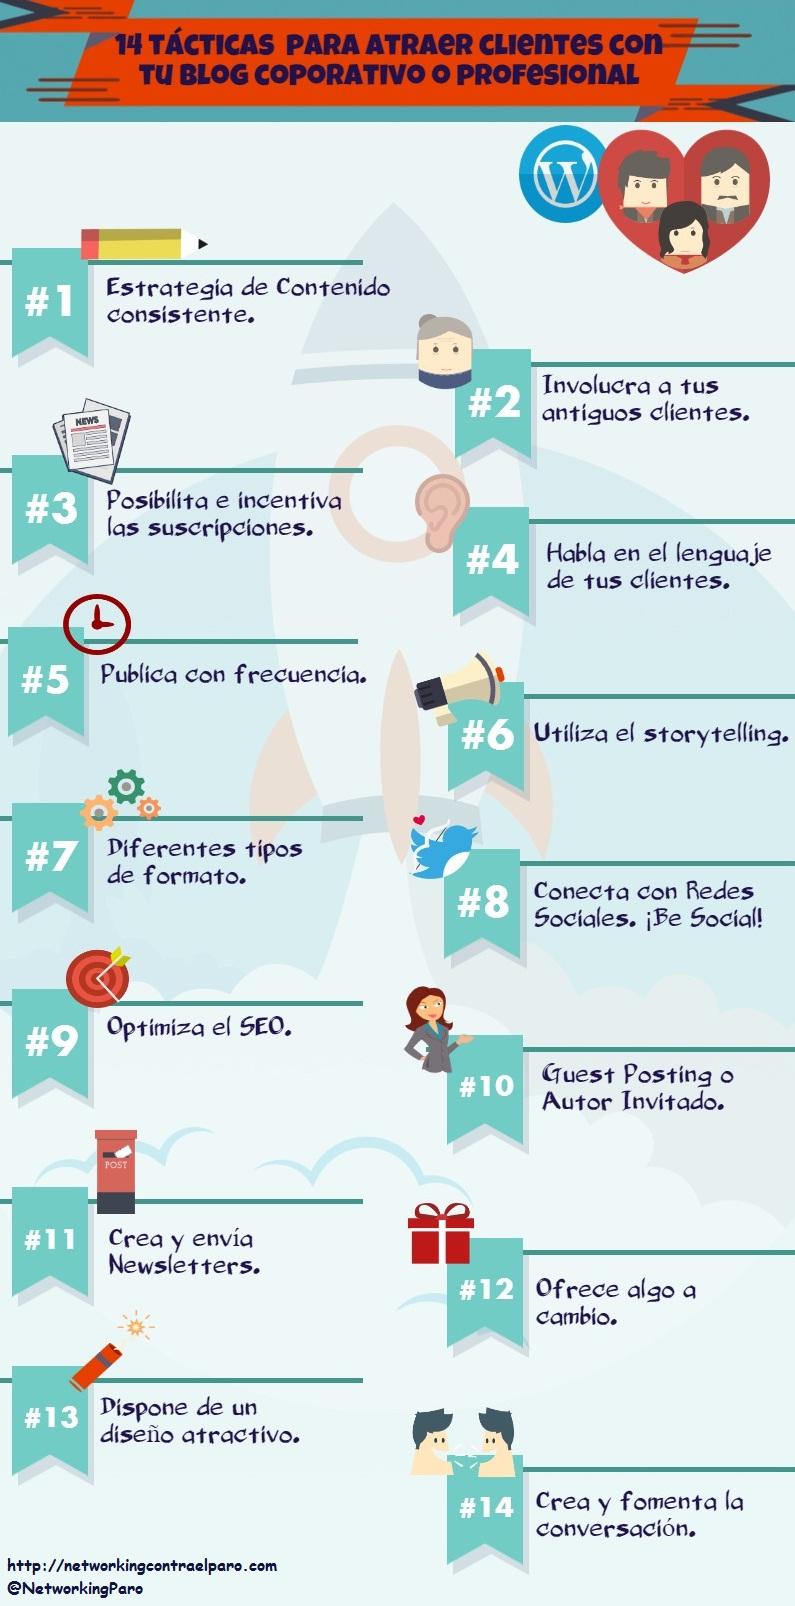 14 tácticas para atraer clientes con tu Blog Corporativo